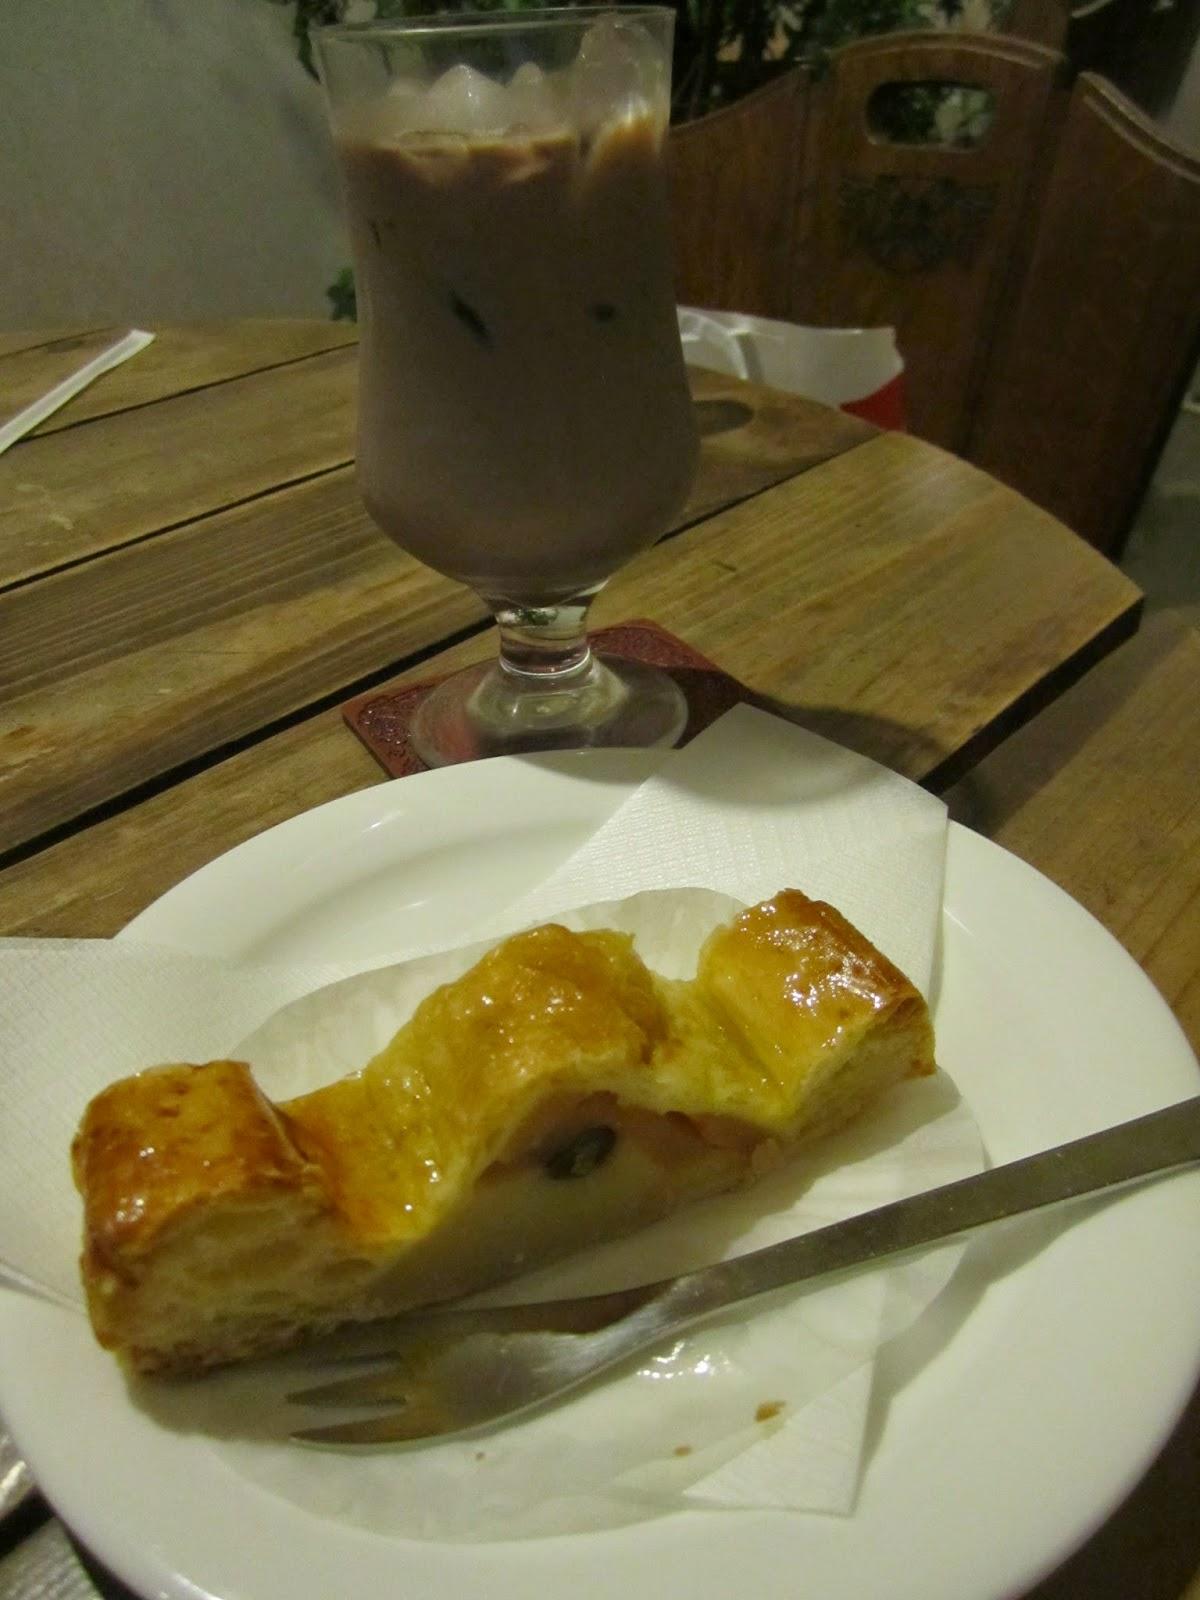 Apple and Sweet Potato Pie Gaucho Towada Cafe りんごとさつもいものパイ ガウチョ 十和田市 カフェ